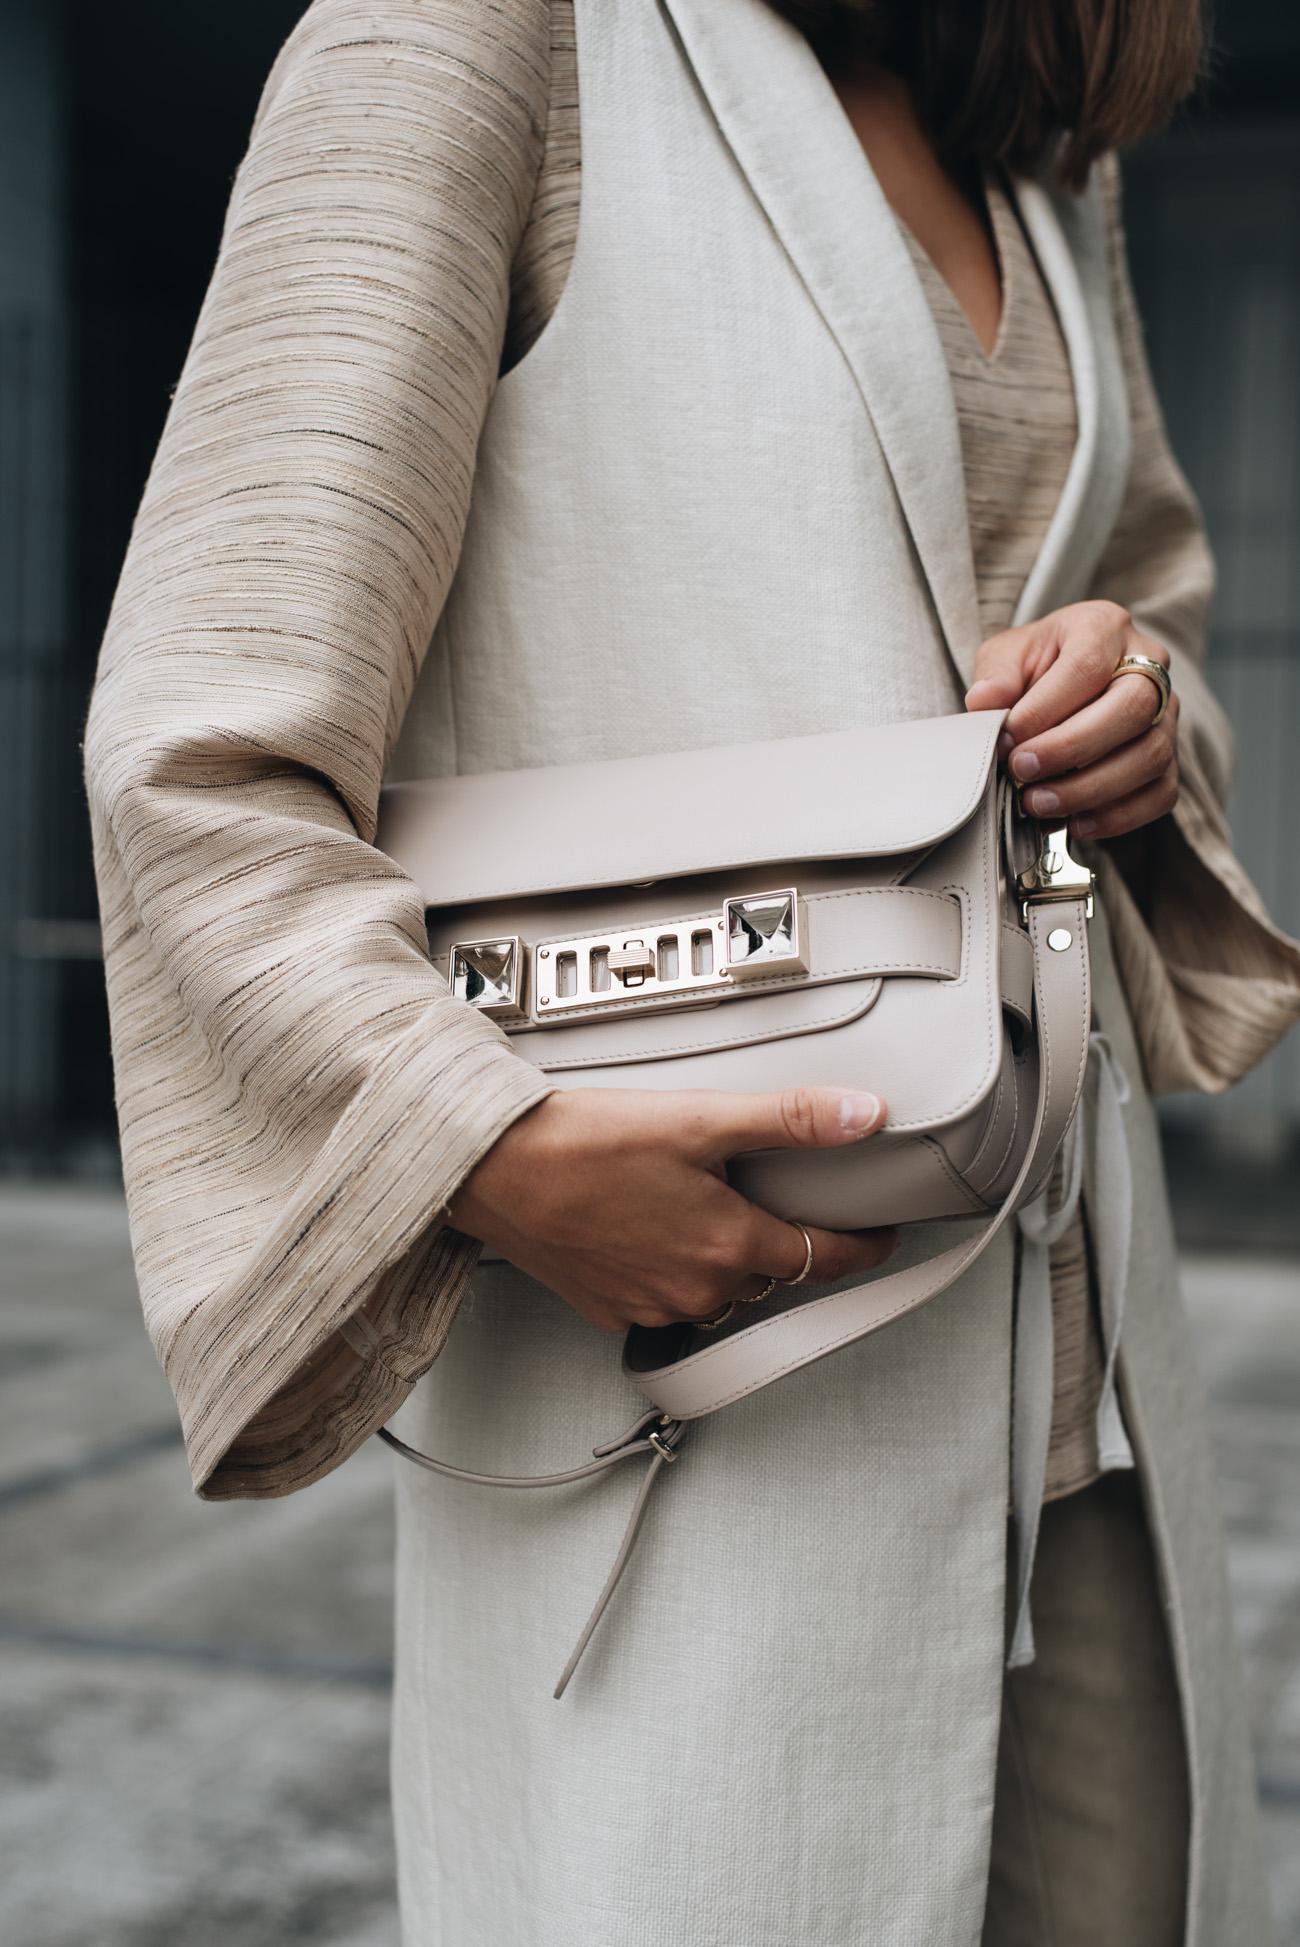 Long-Weste-oversize-bluse-Layering-nude-color-blocking-trend-2017-nina-schwichtenberg-fashiioncarpet